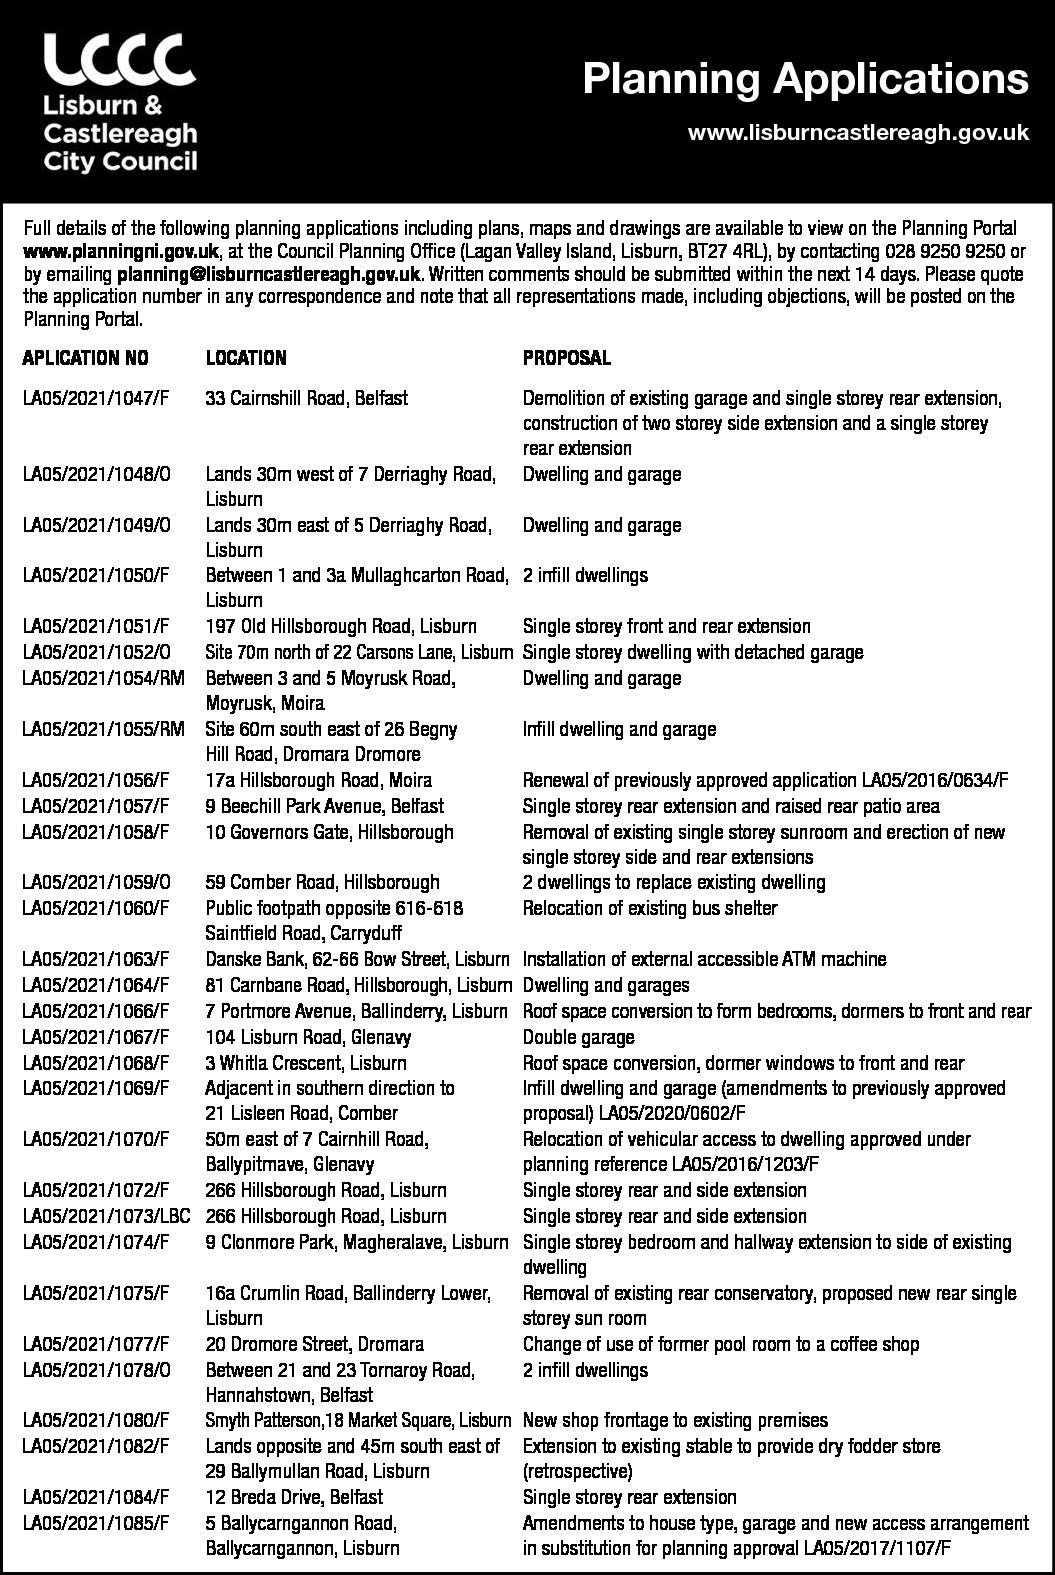 Lisburn & Castlereagh City Council - Planning Applications